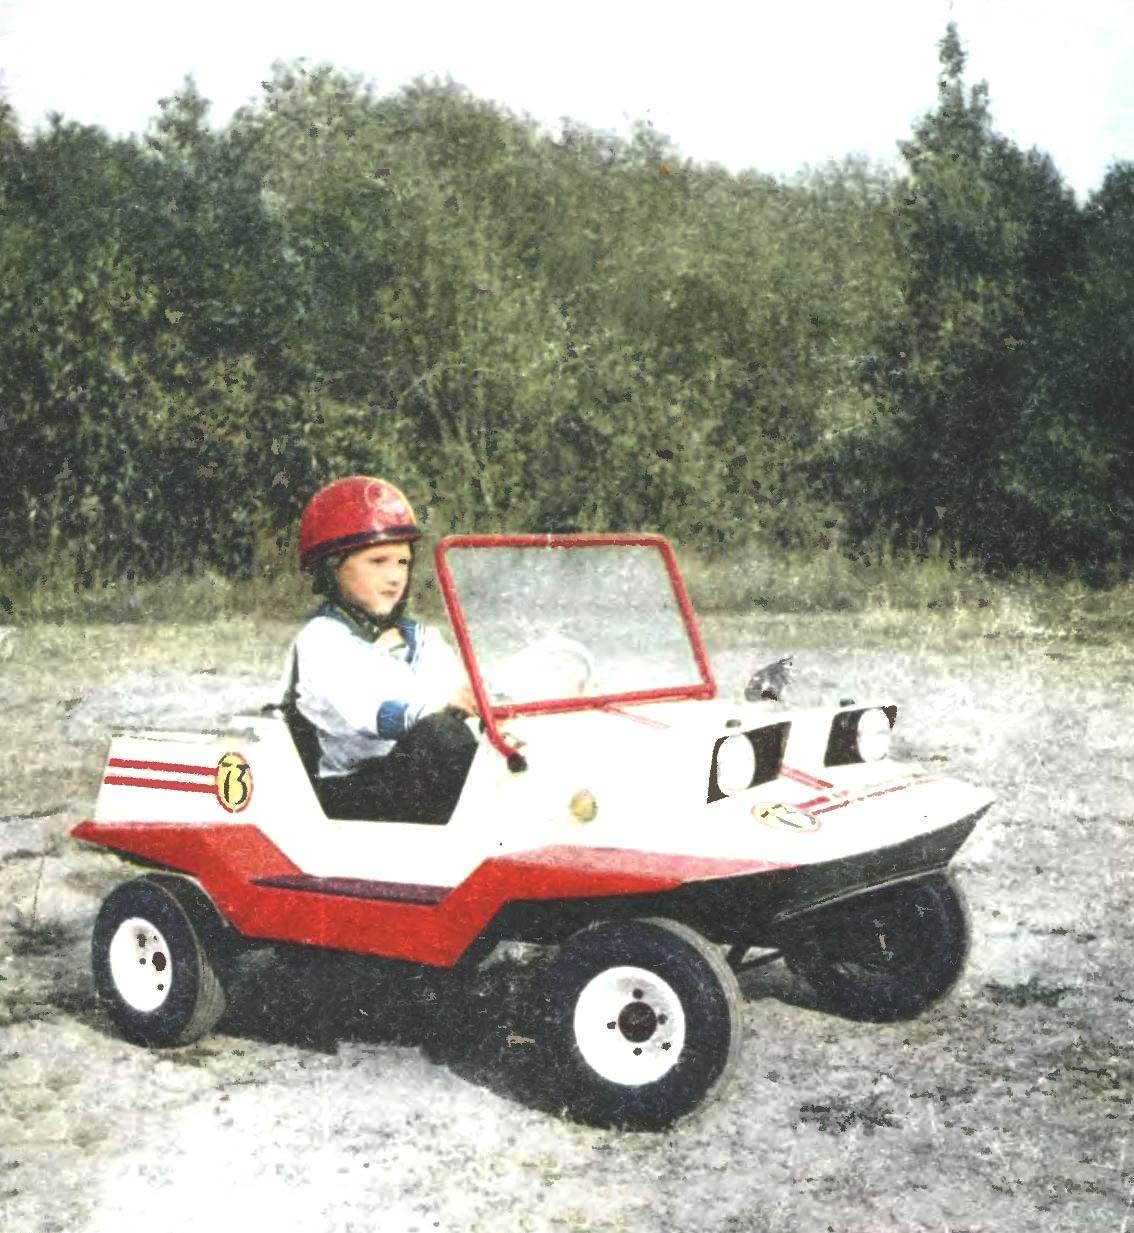 LITTLE MICRO-CAR